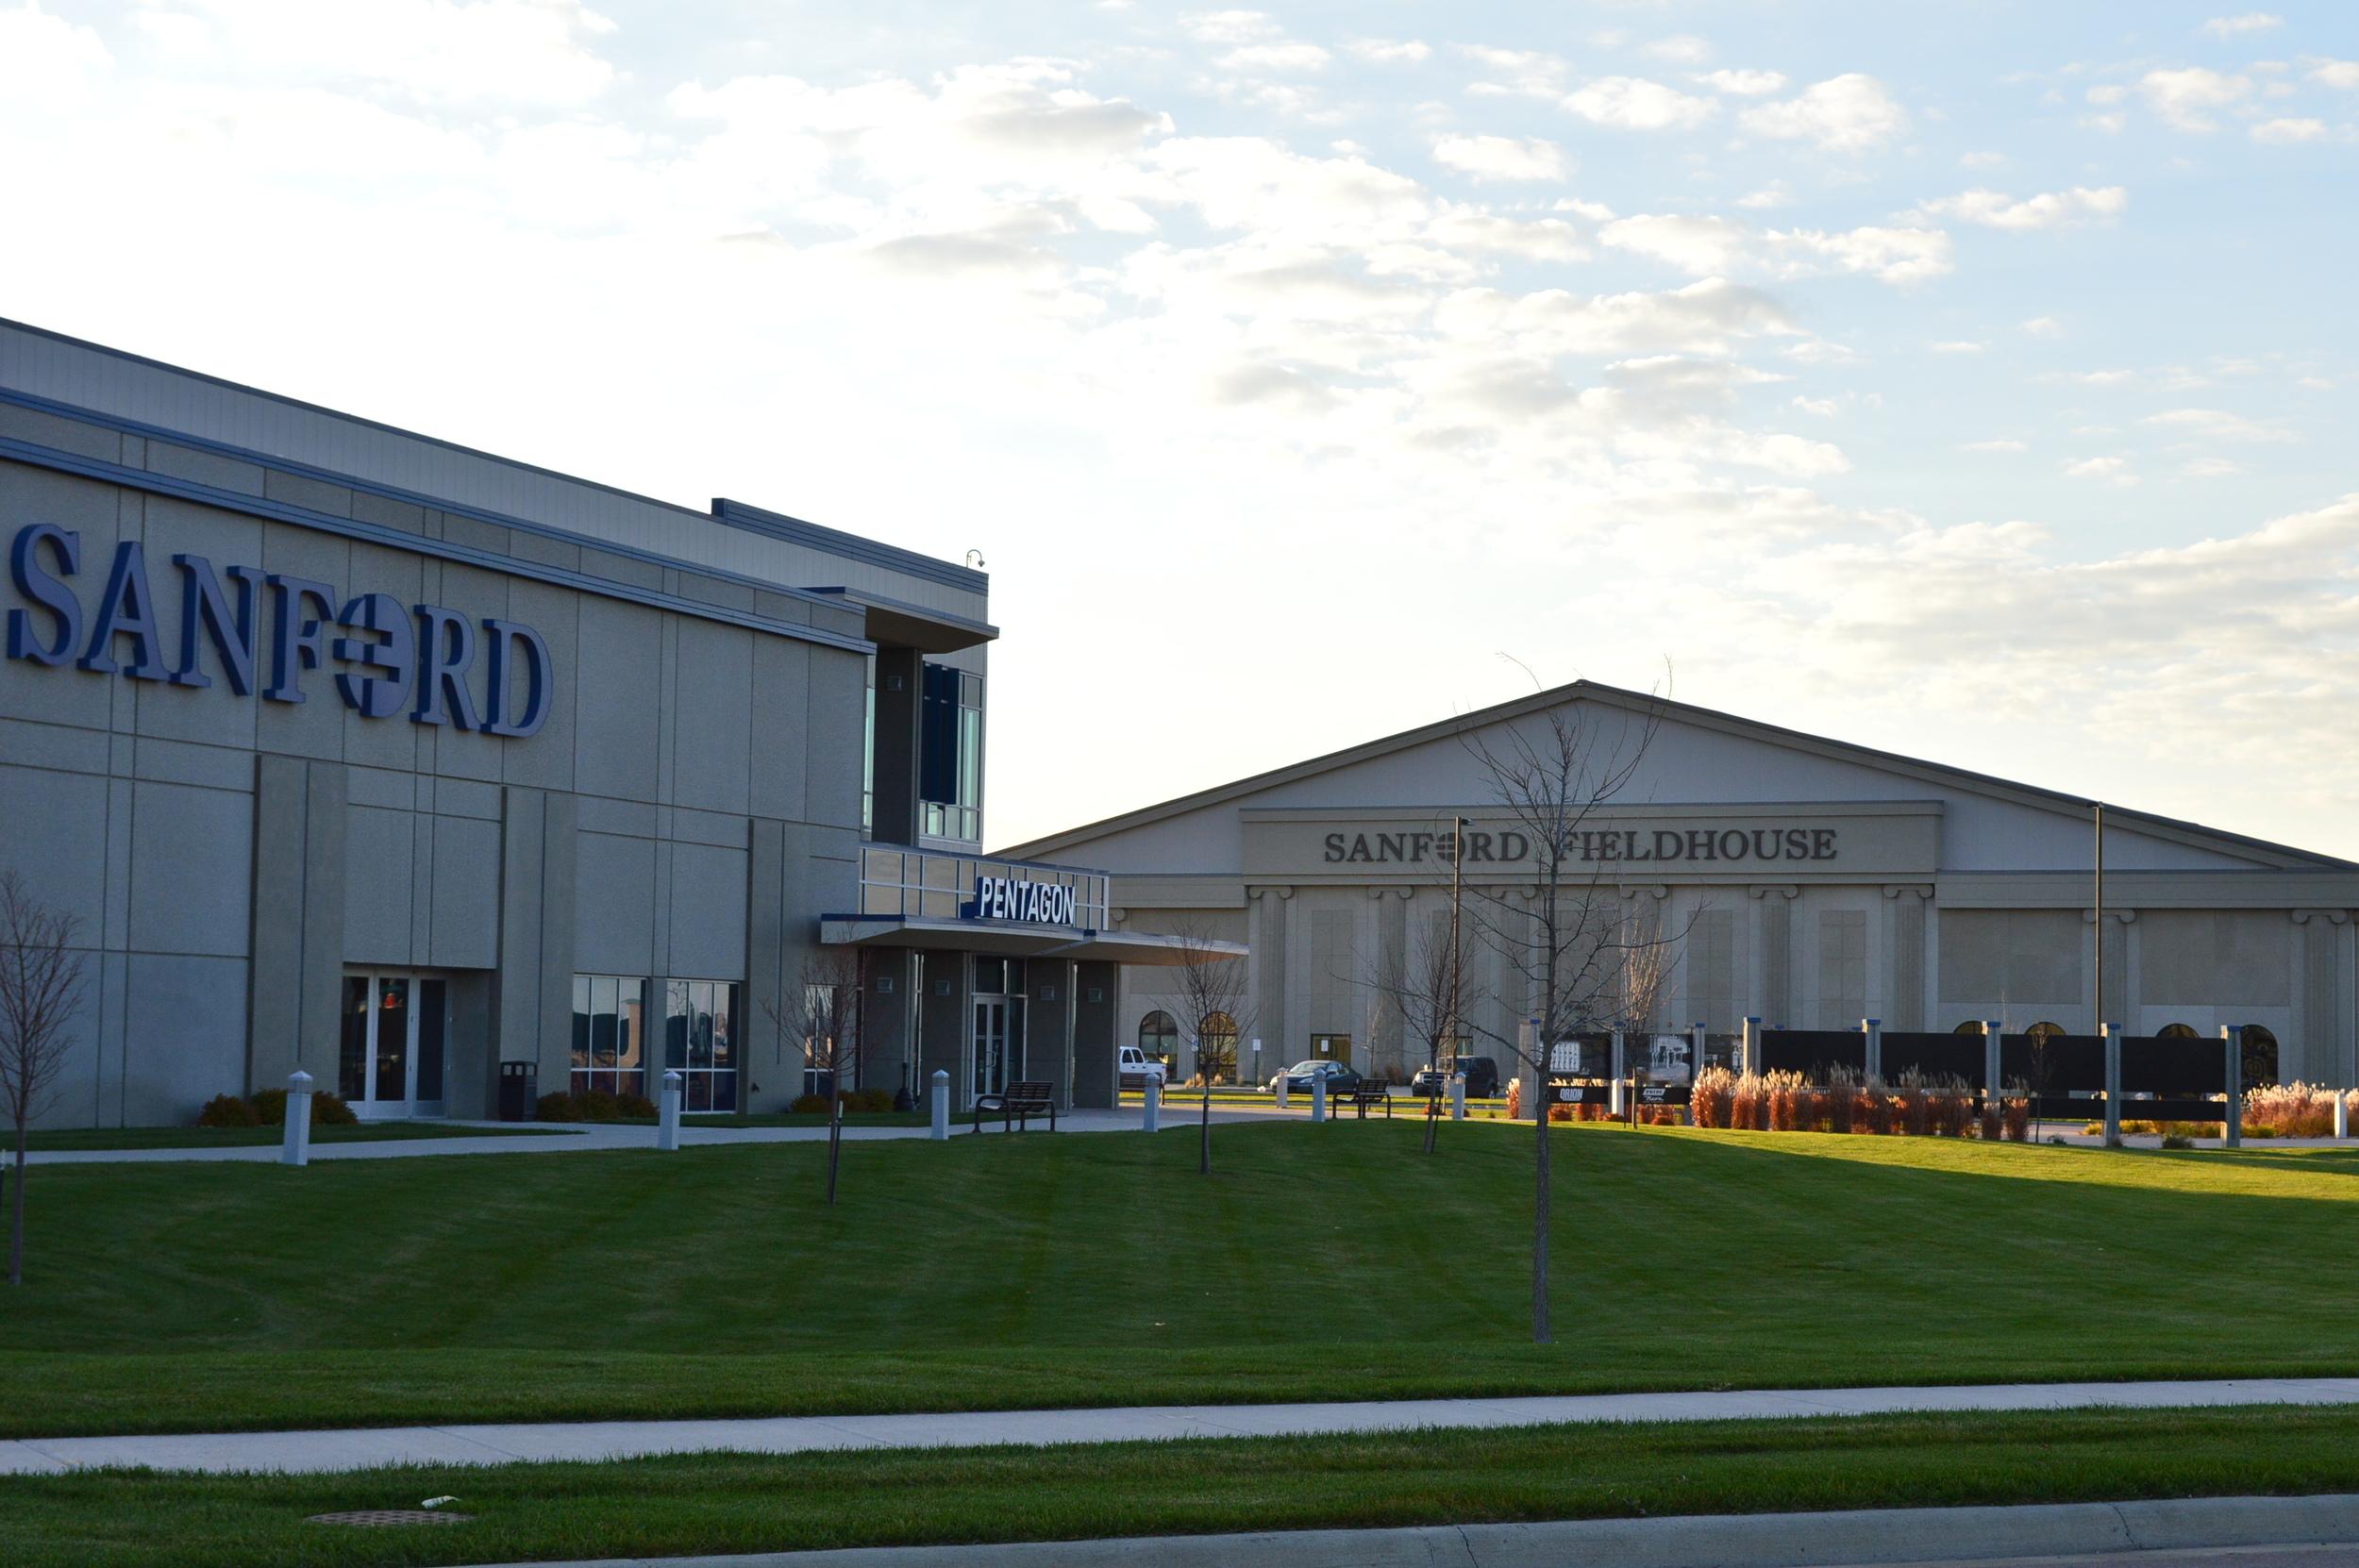 Sanford Pentagon & Fieldhouse